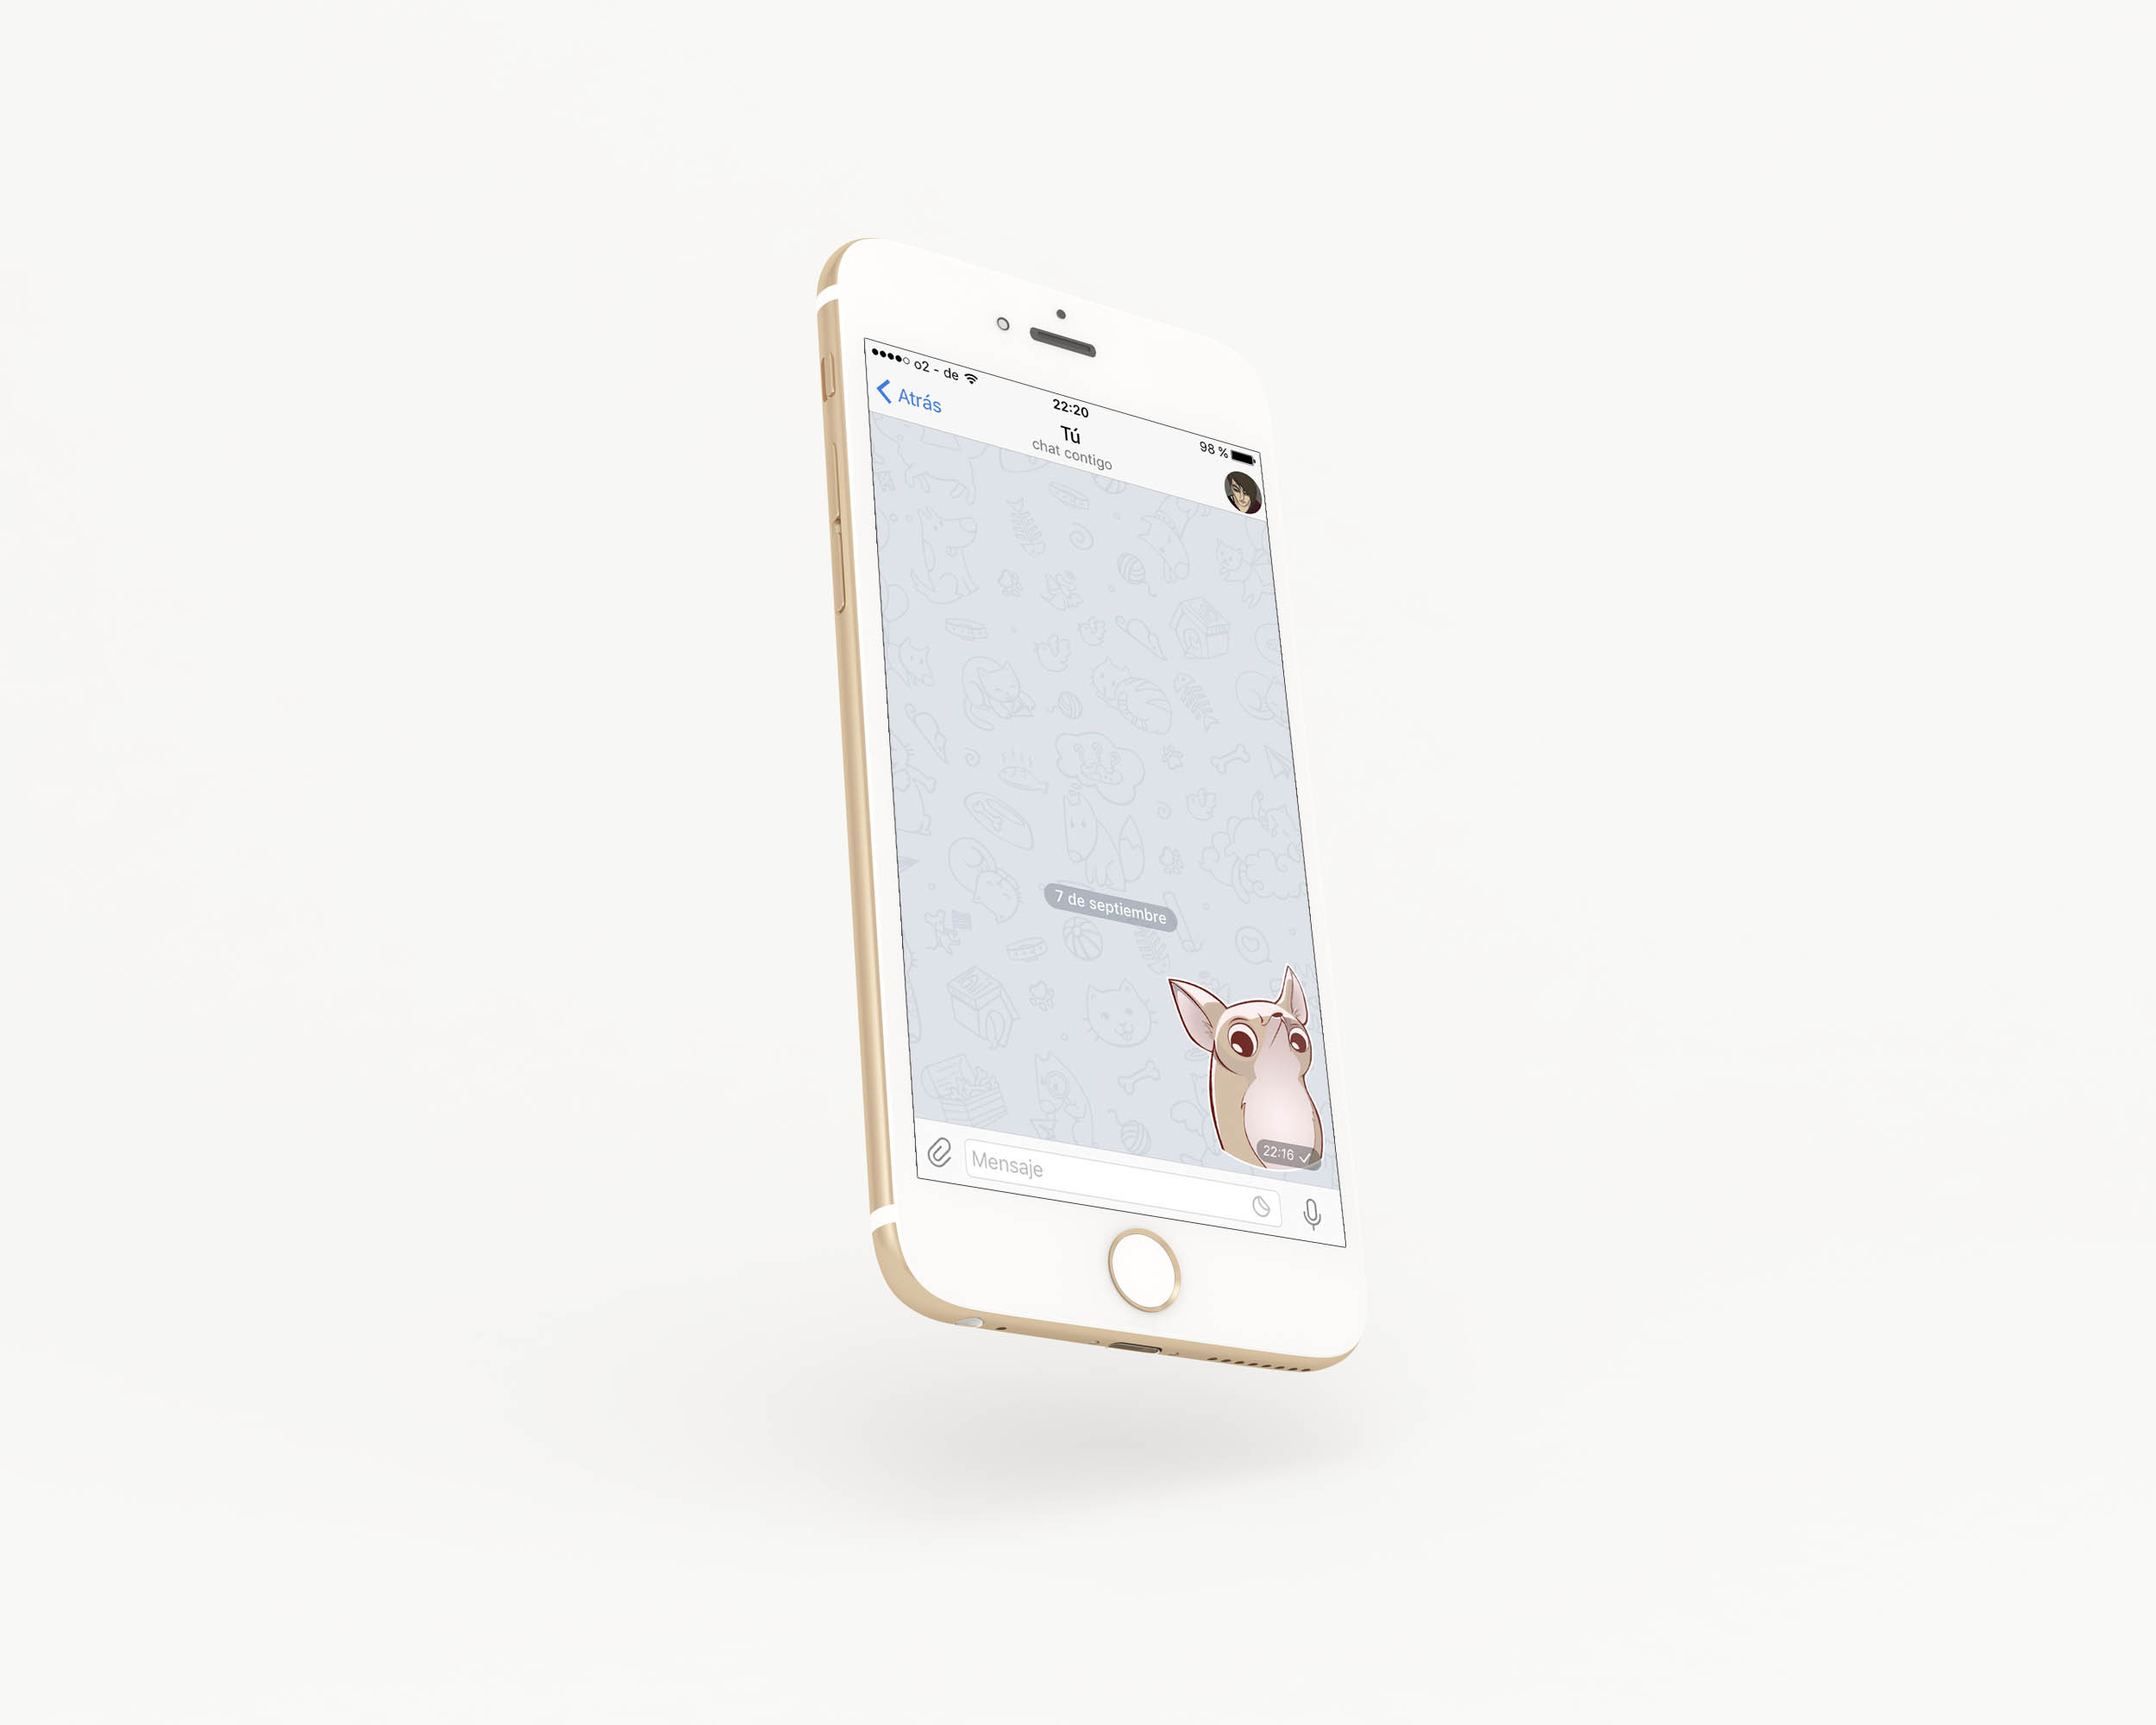 gravity-iphone-6s-mockup.jpg